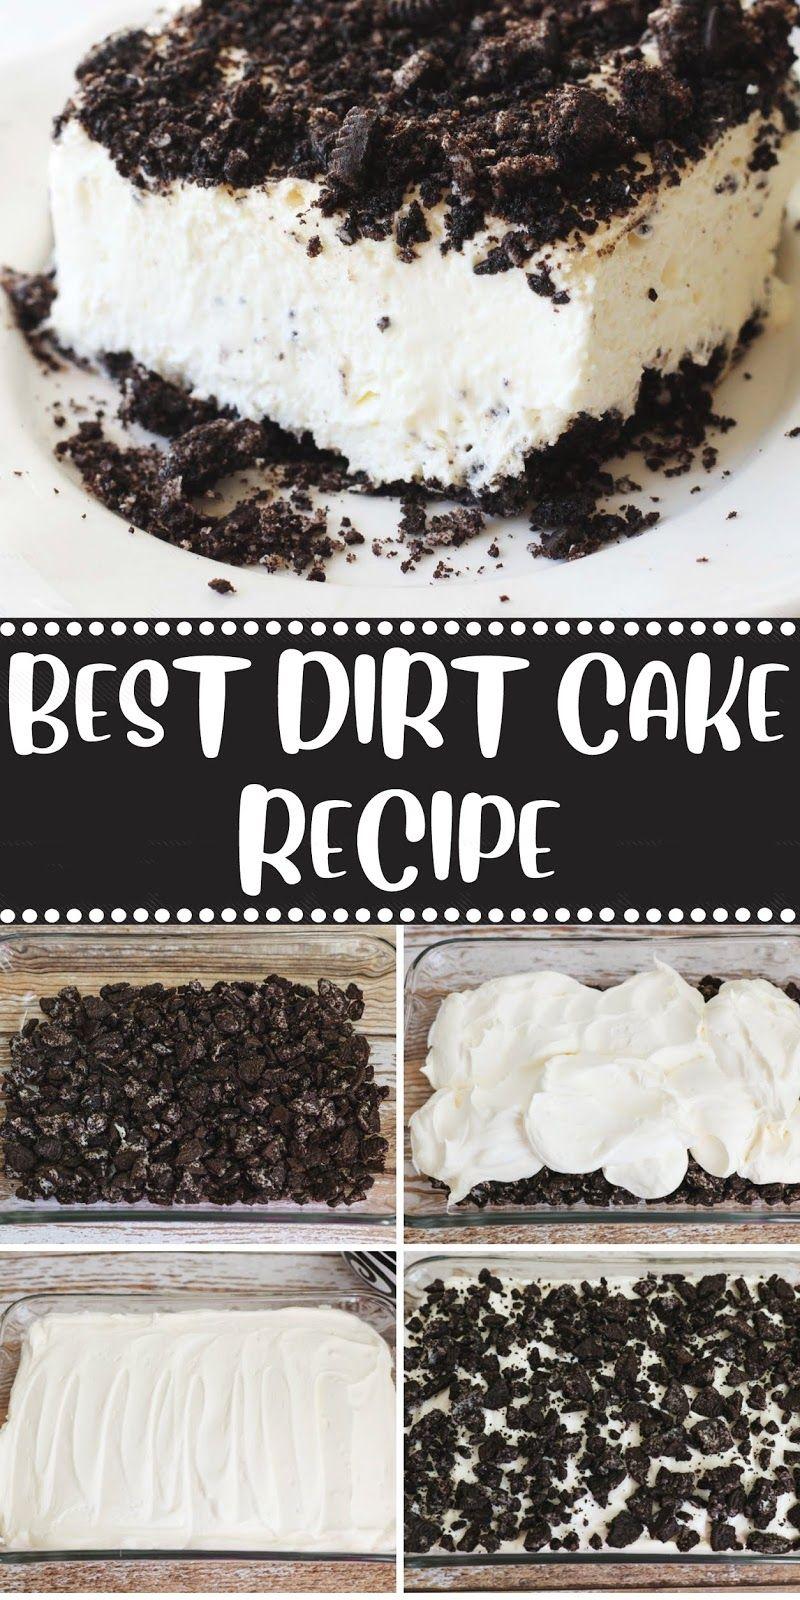 Best Dirt Cake Recipe In 2020 Dirt Cake Recipes Dirt Cake Dirt Dessert